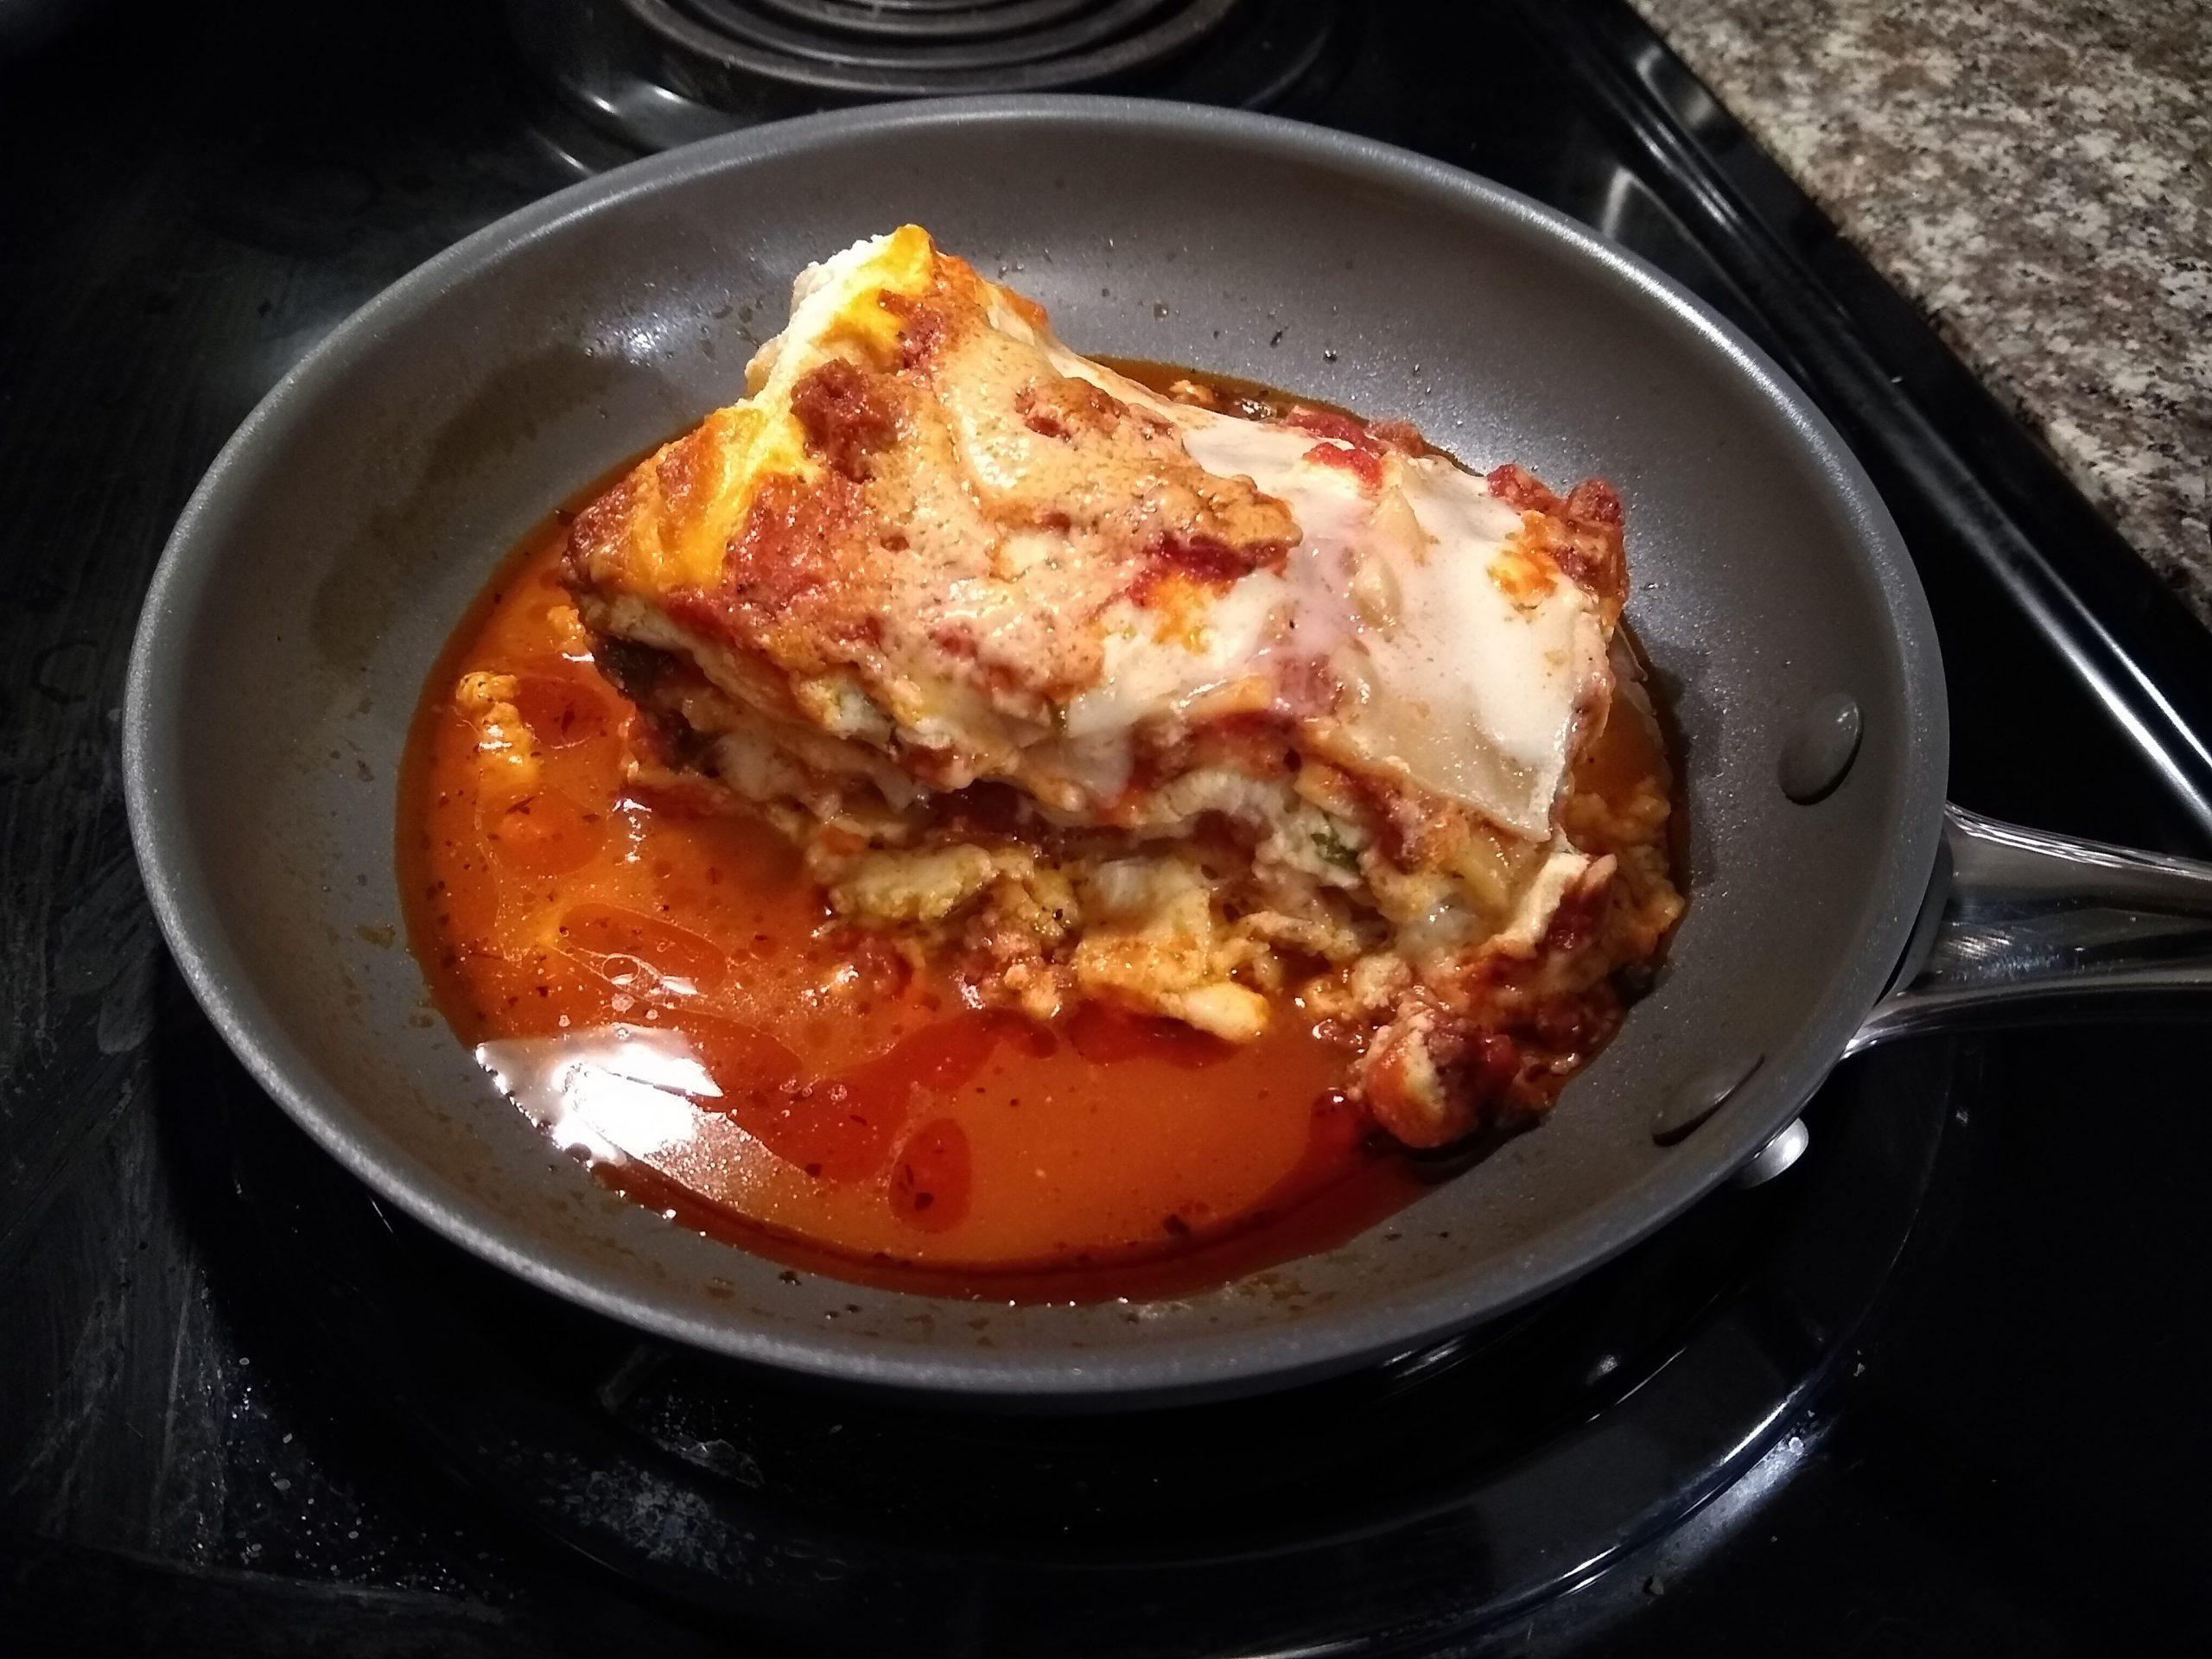 reheating lasagna in skillet